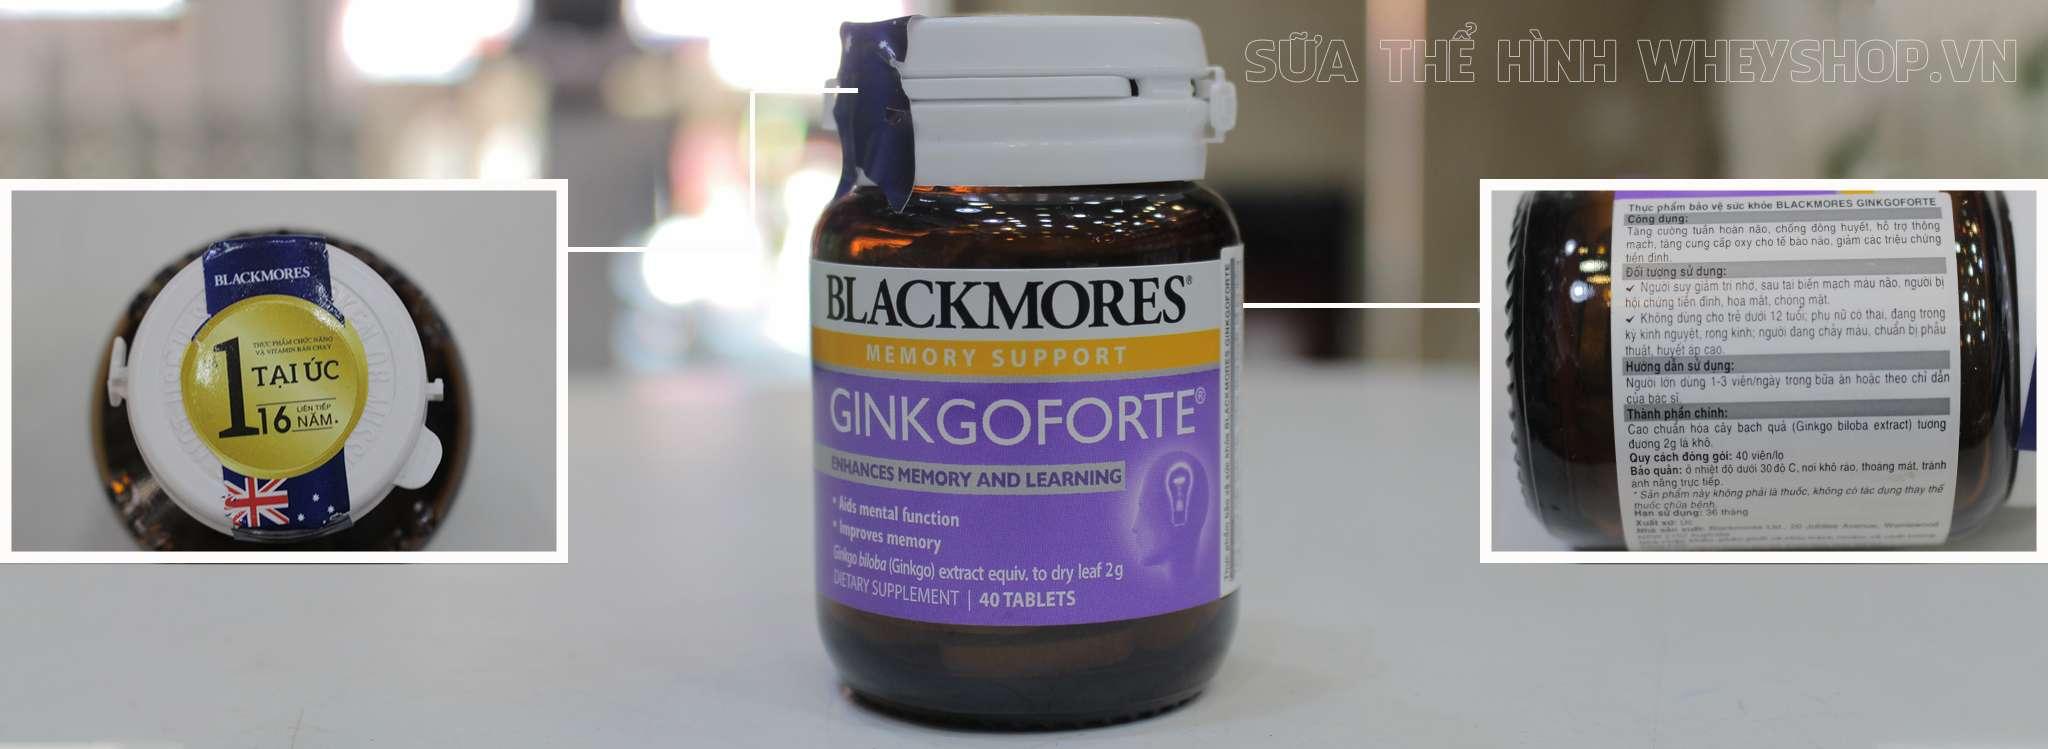 Blackmores Ginkgoforte 40 vien tem nhan hieu chinh hang tai wheyshop